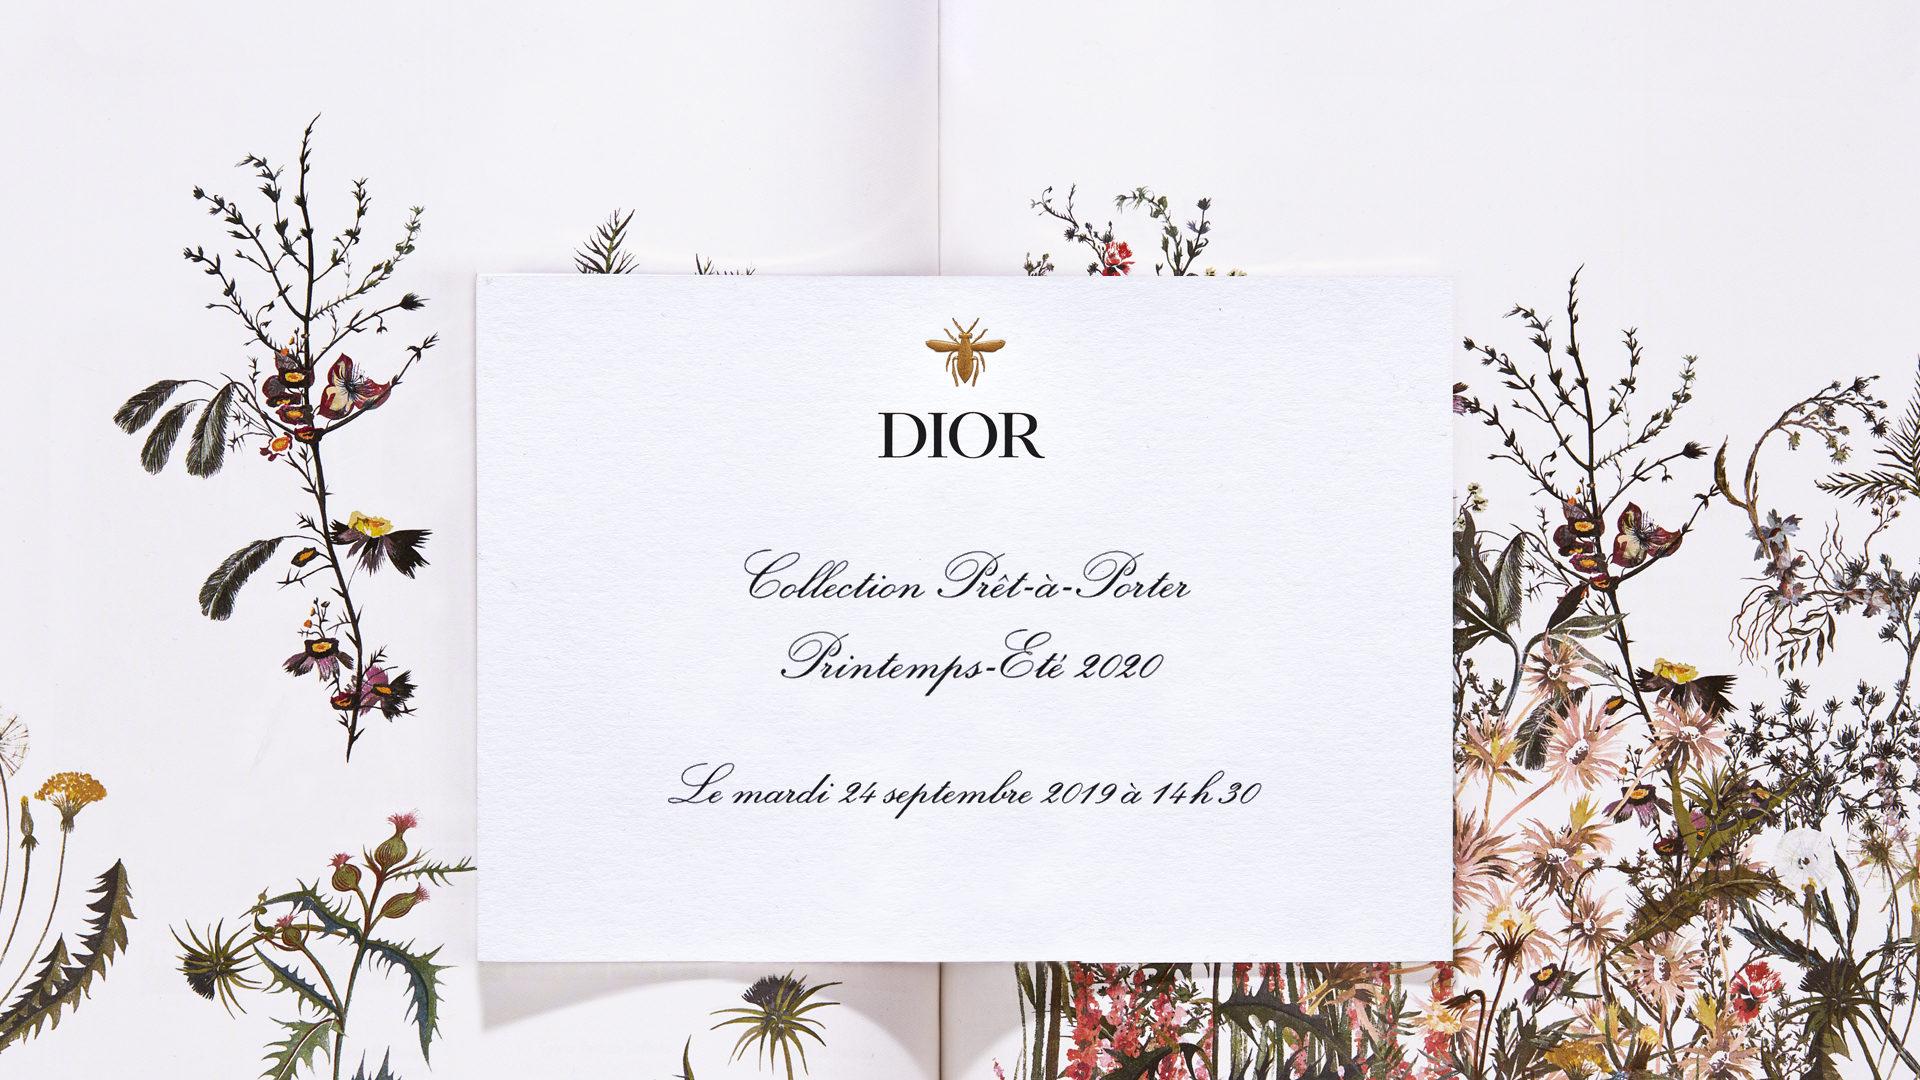 Watch: Dior's Spring/Summer 2020 Runway Show live from Paris Fashion Week